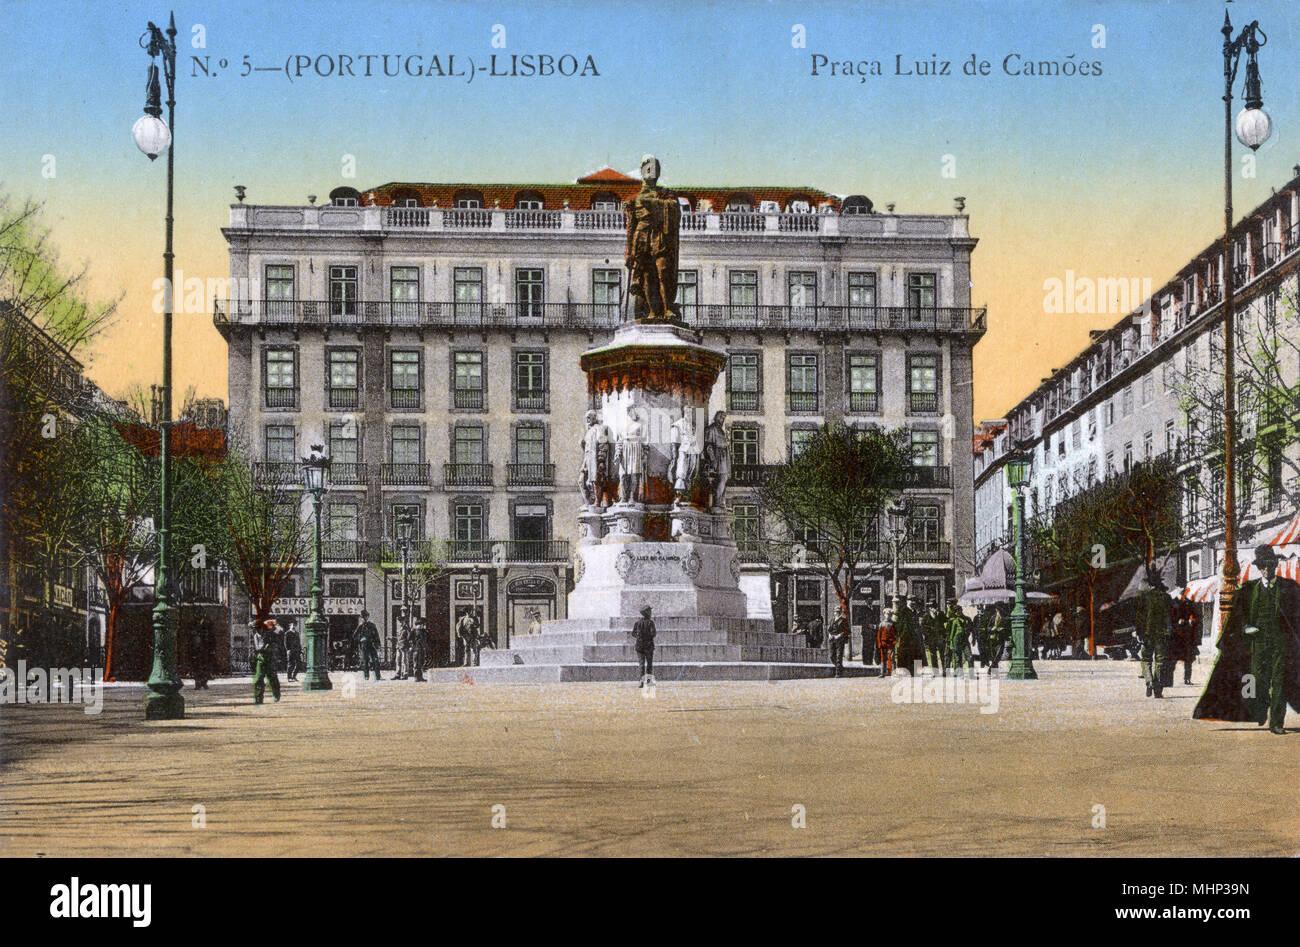 Lisboa dating Portugal